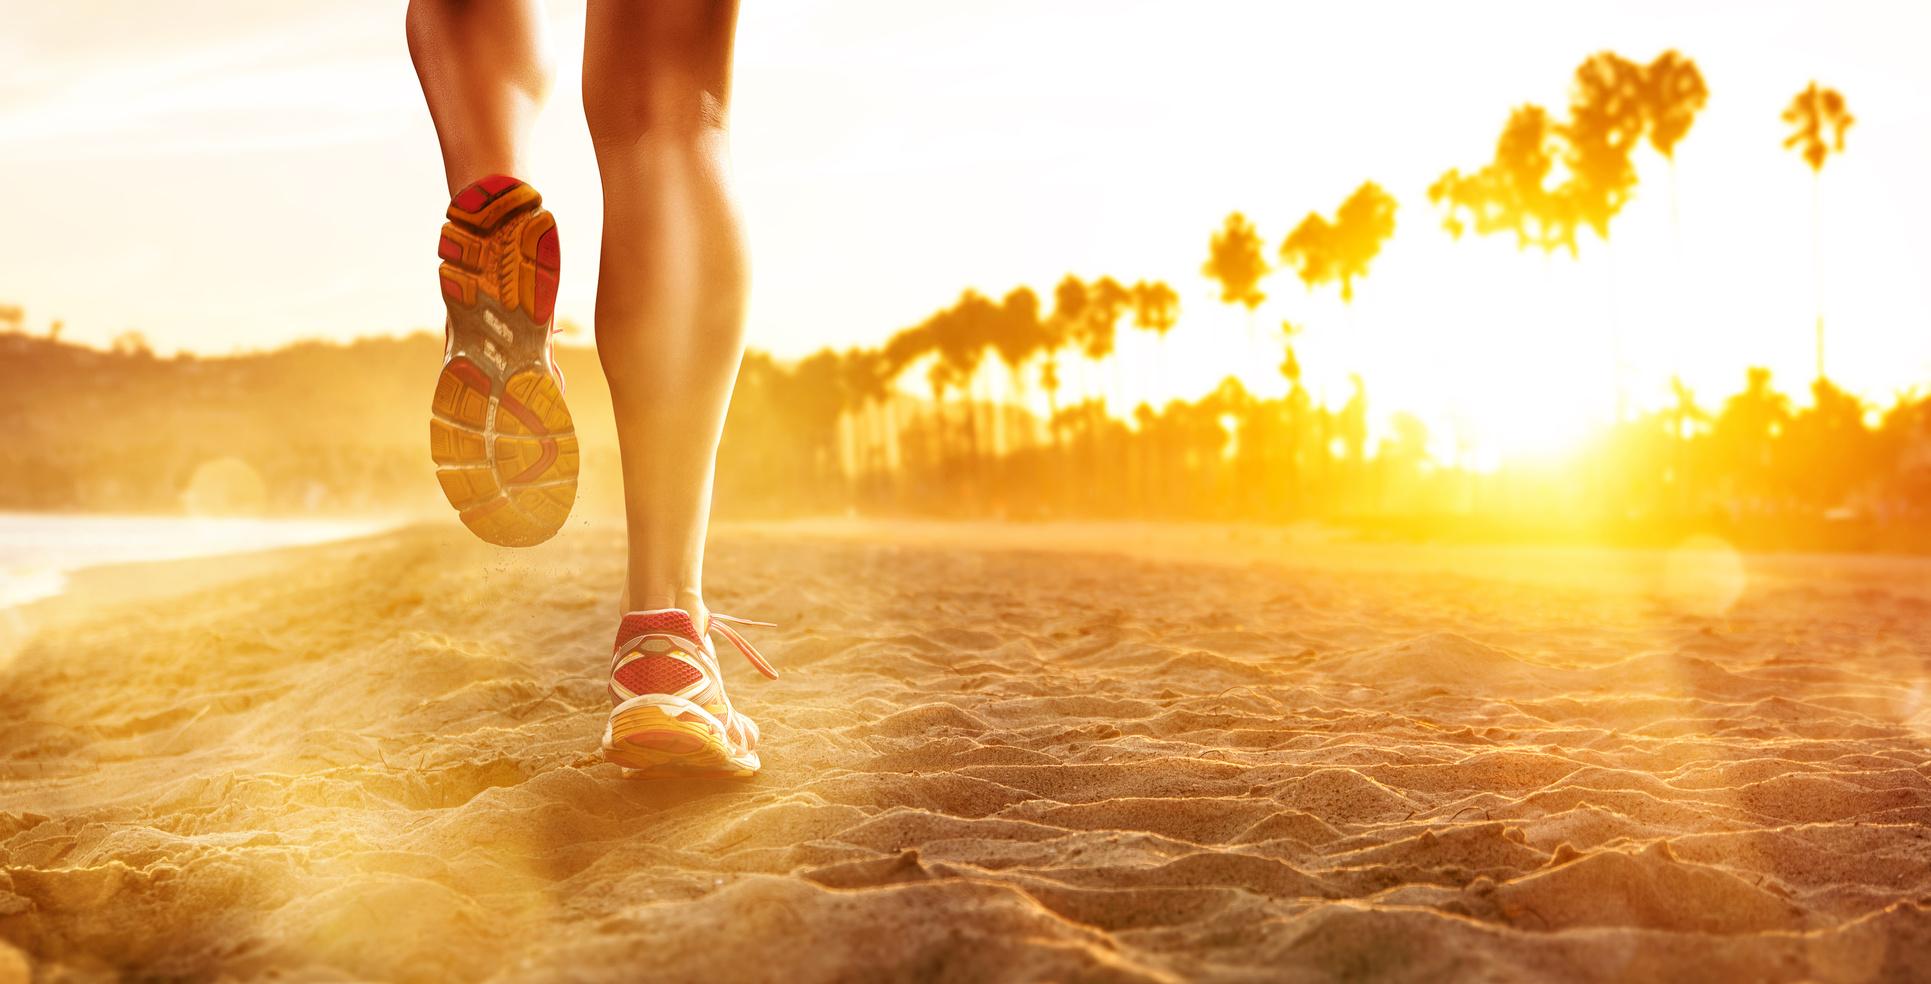 Habits not discipline! Measure, not just do.